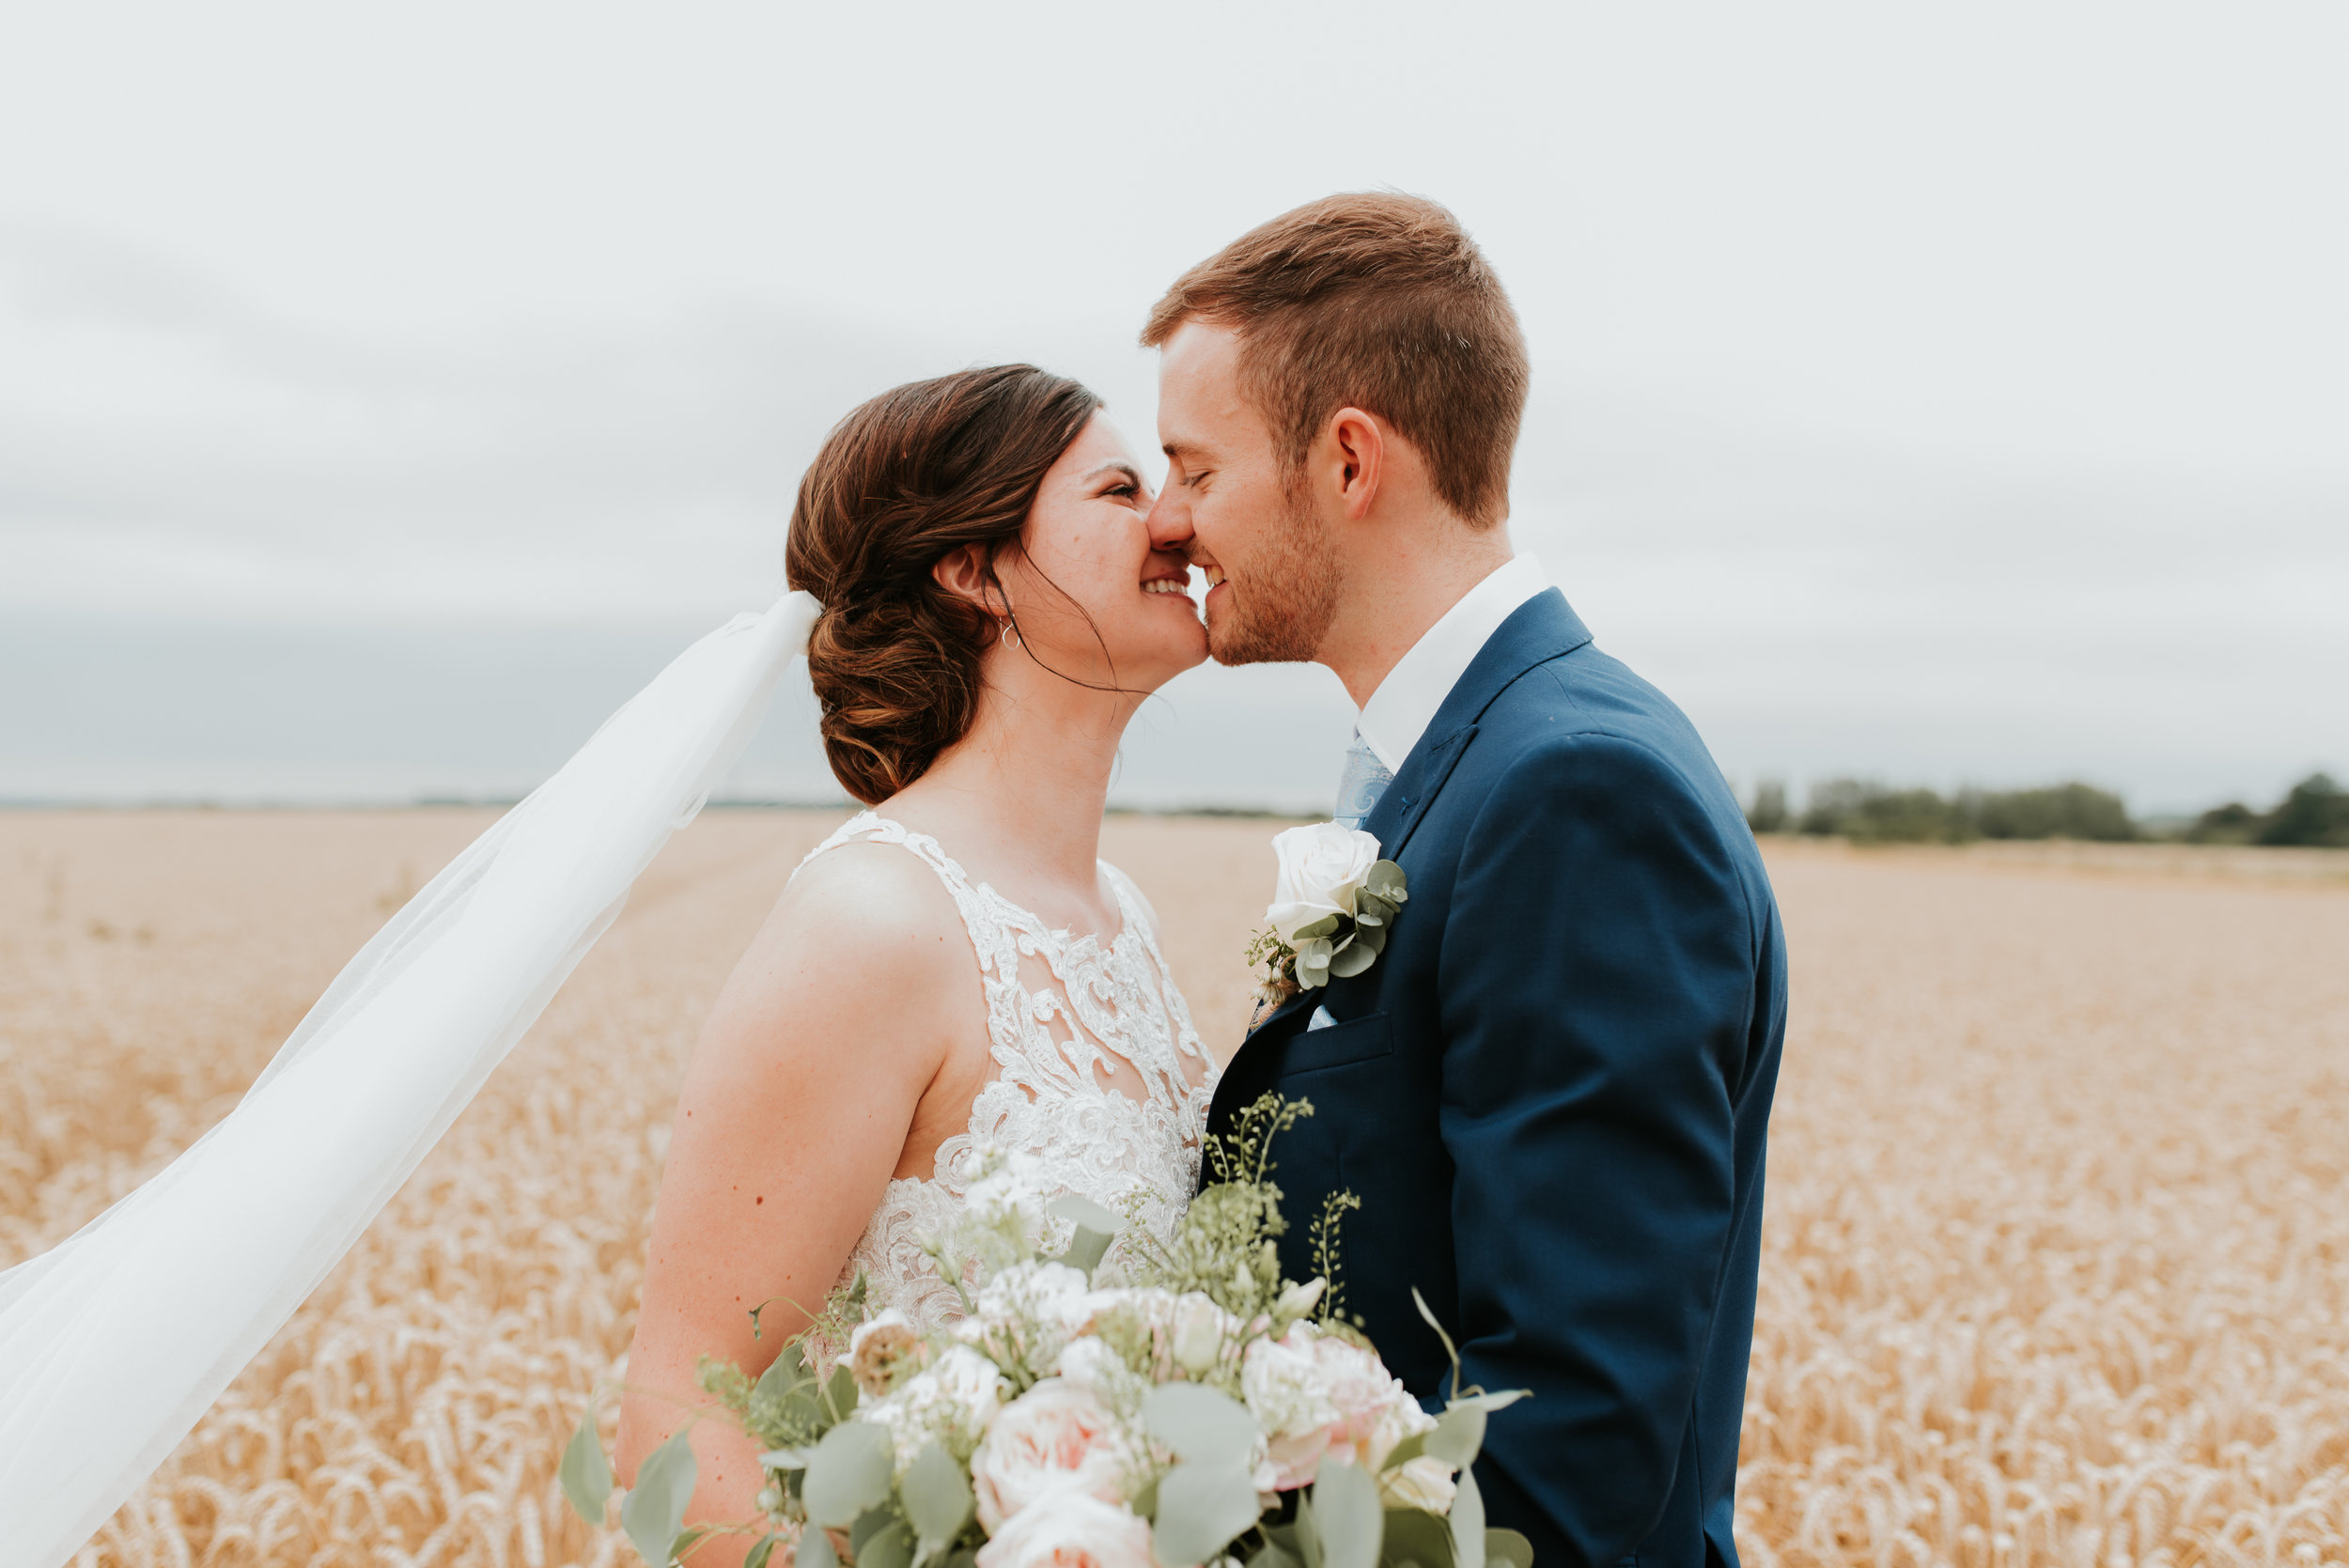 Oxfordshire-wedding-photographer-1.jpg